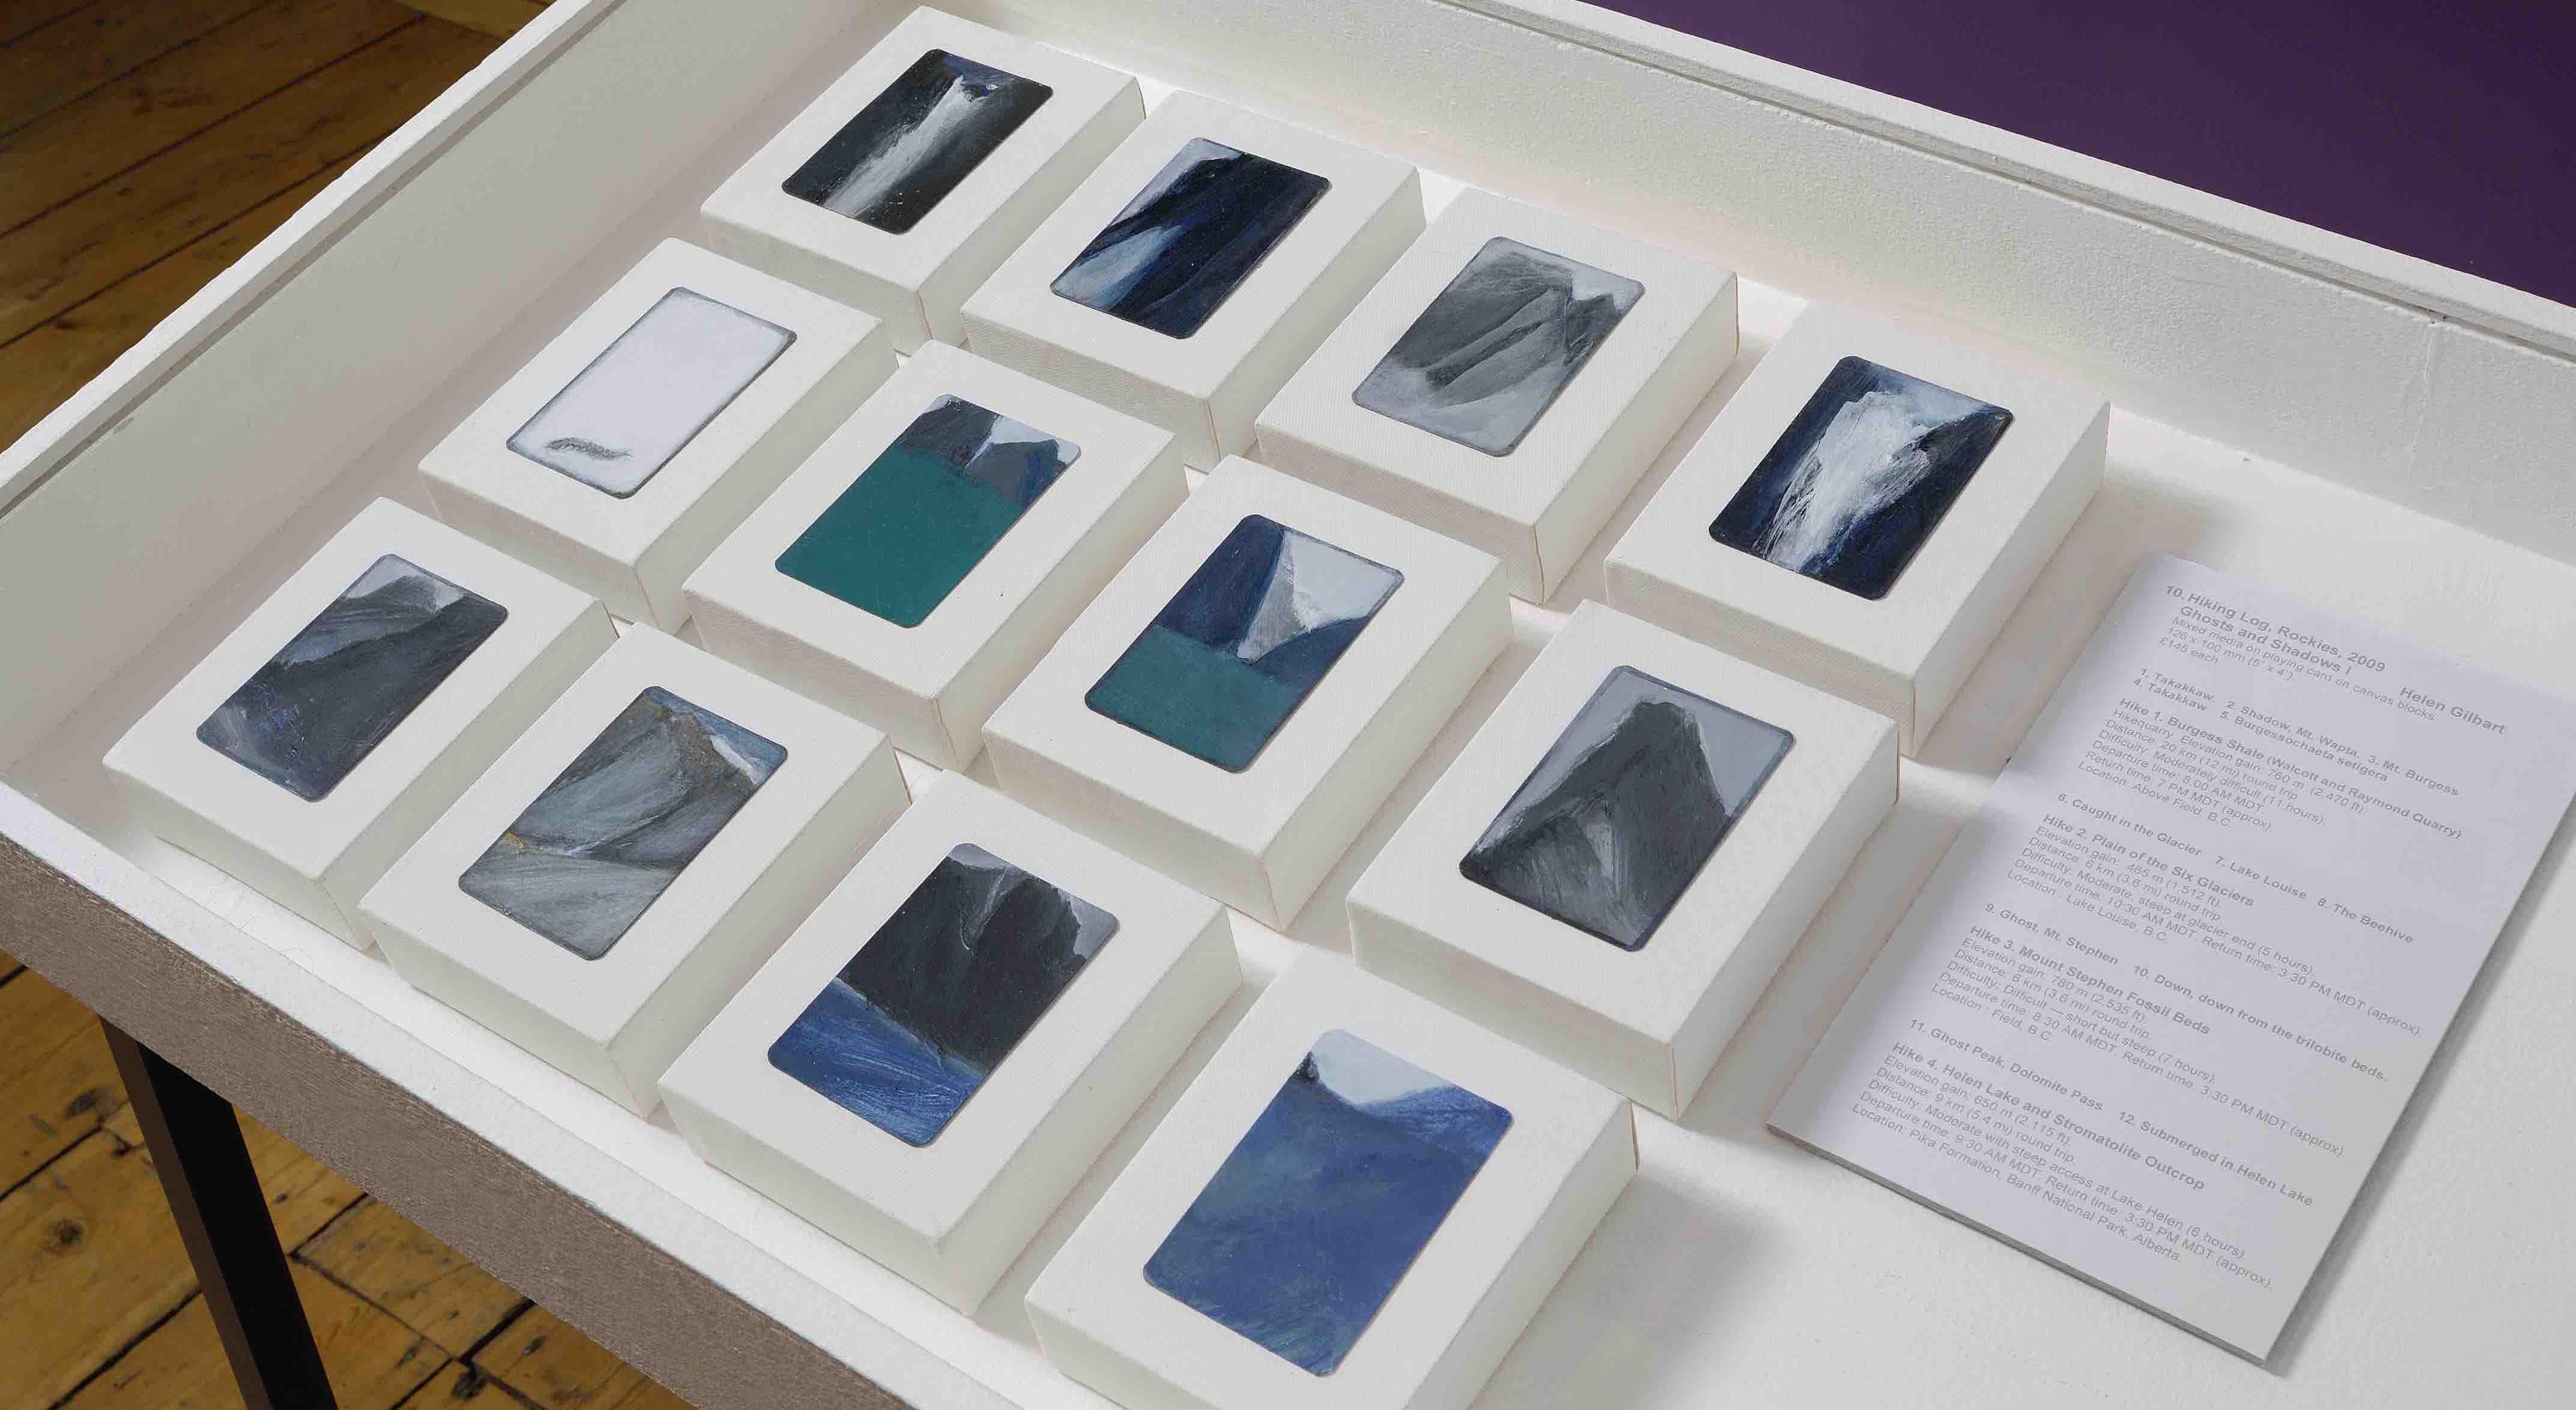 HIKING LOG, ROCKIES - Helen Gilbart   UK based Visual Artist